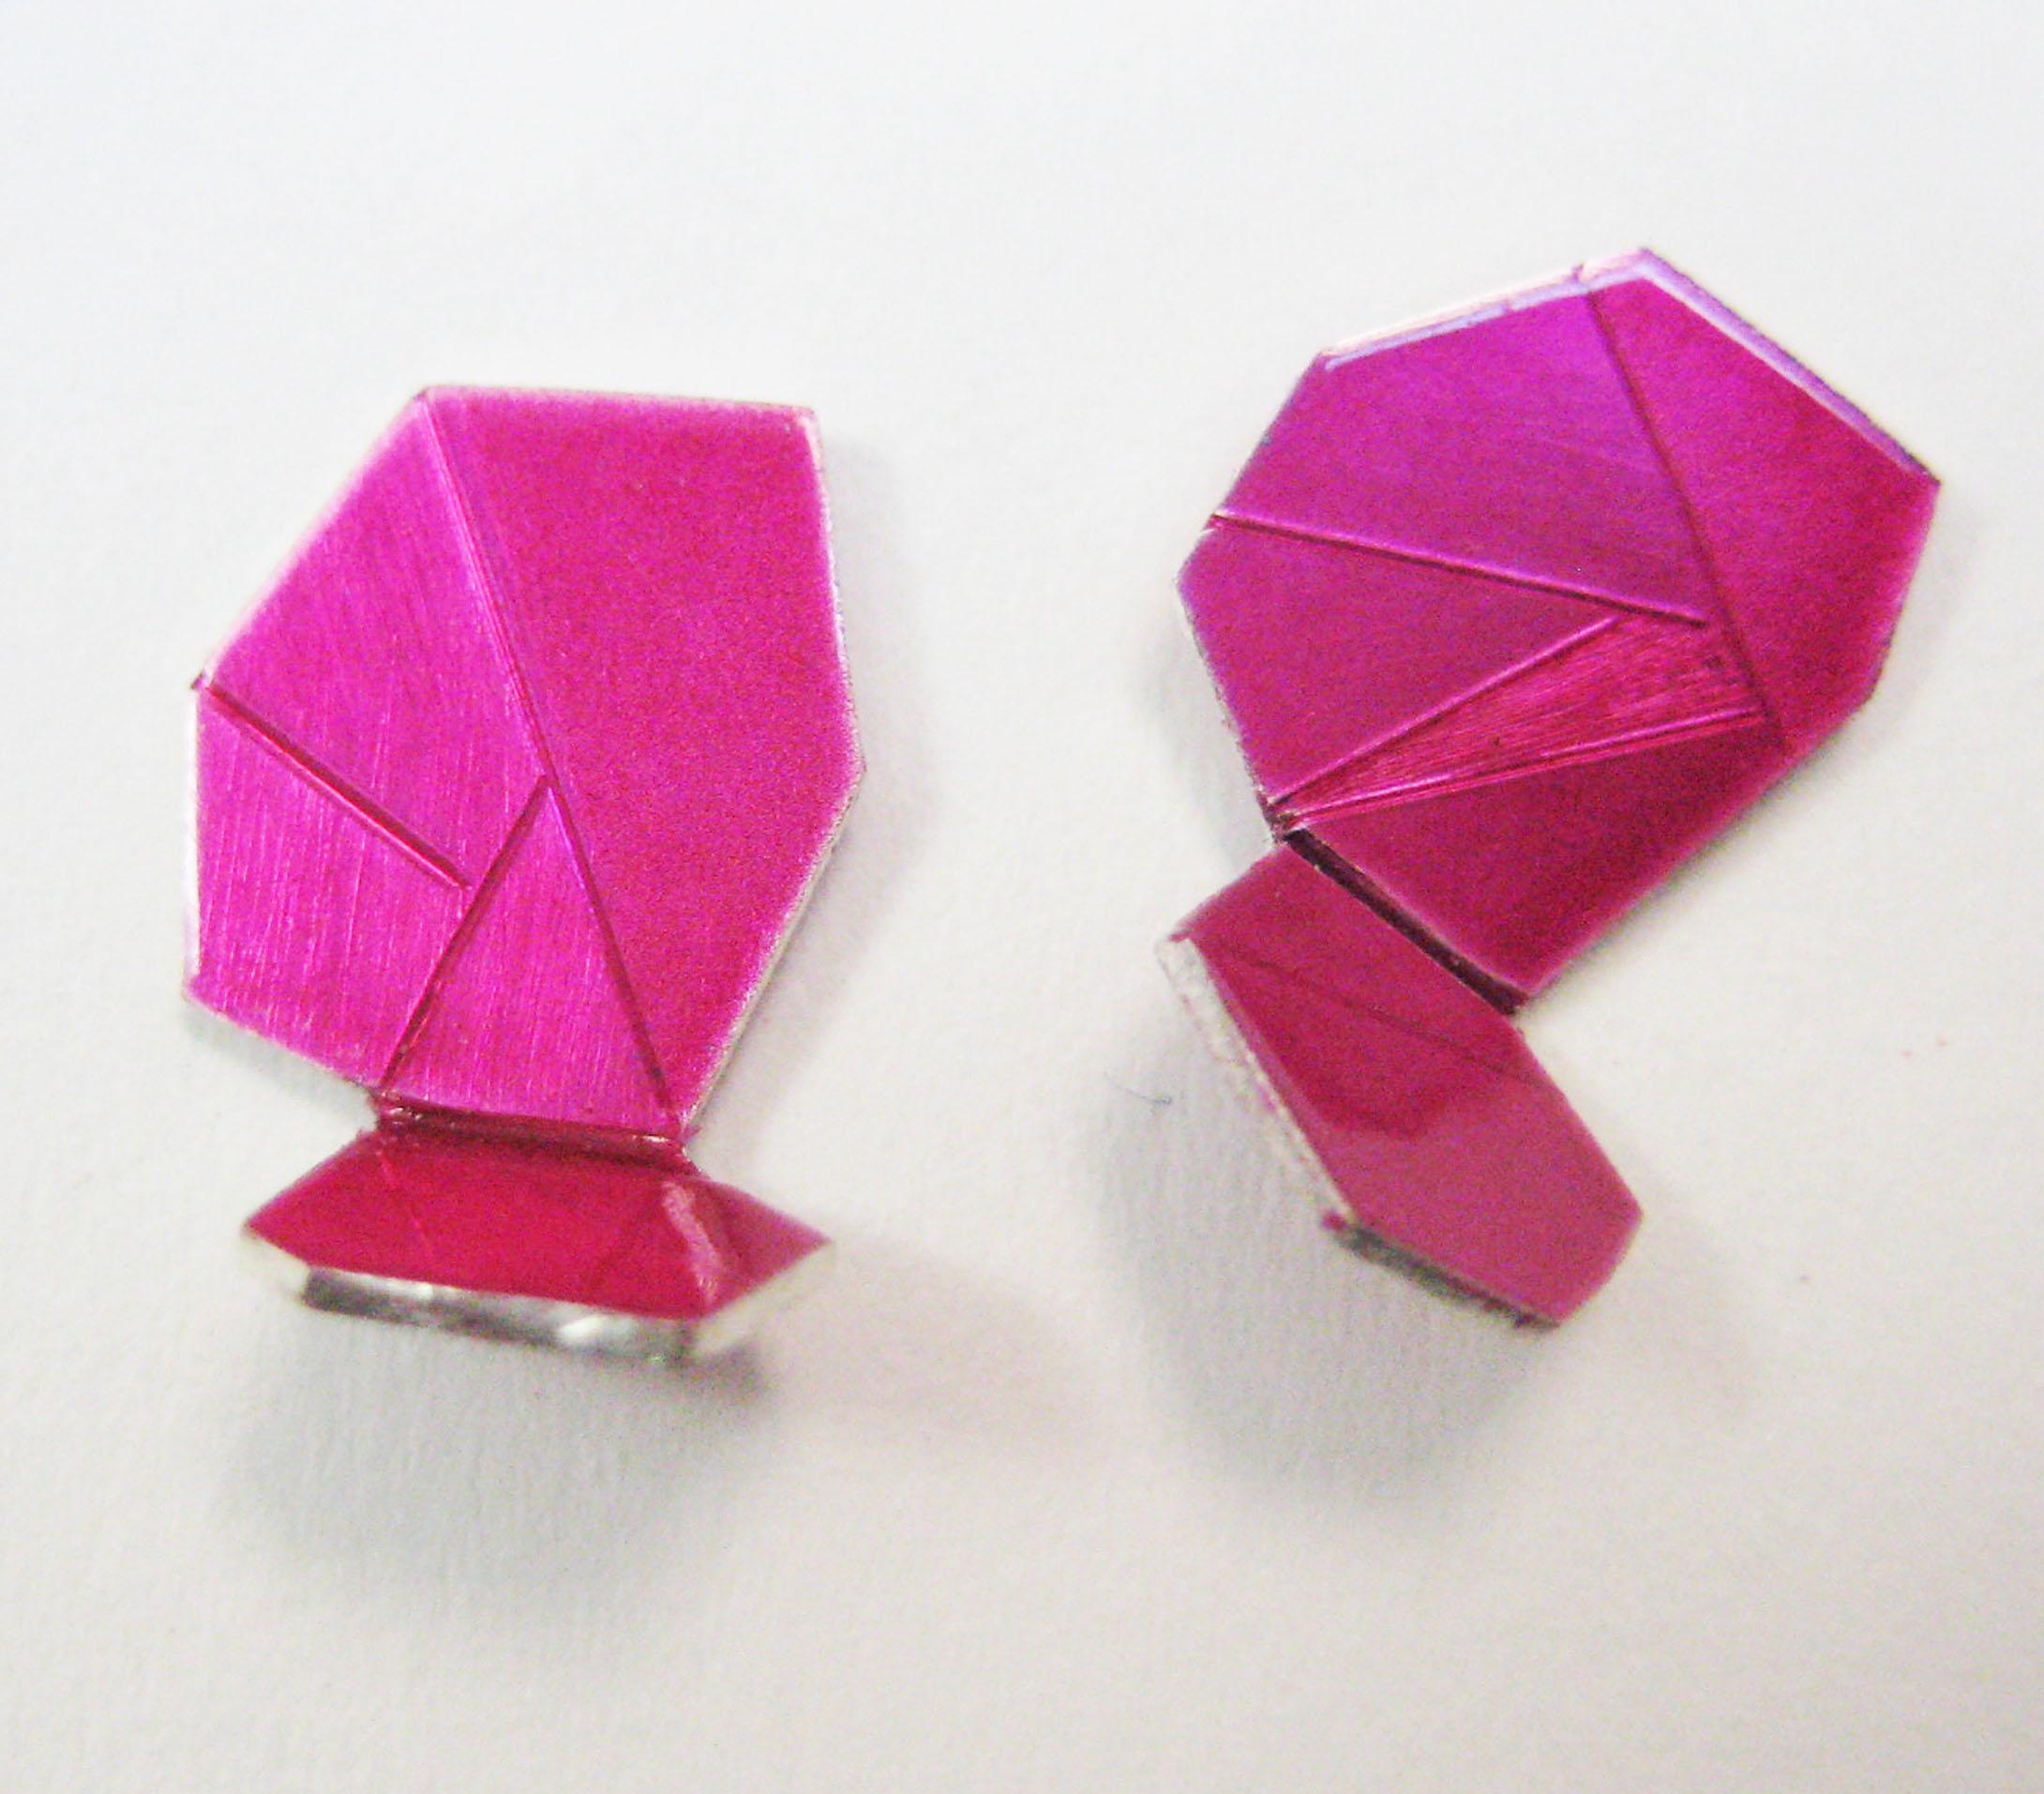 5-Smal Raspberry Ear Gems-Voegele.jpg